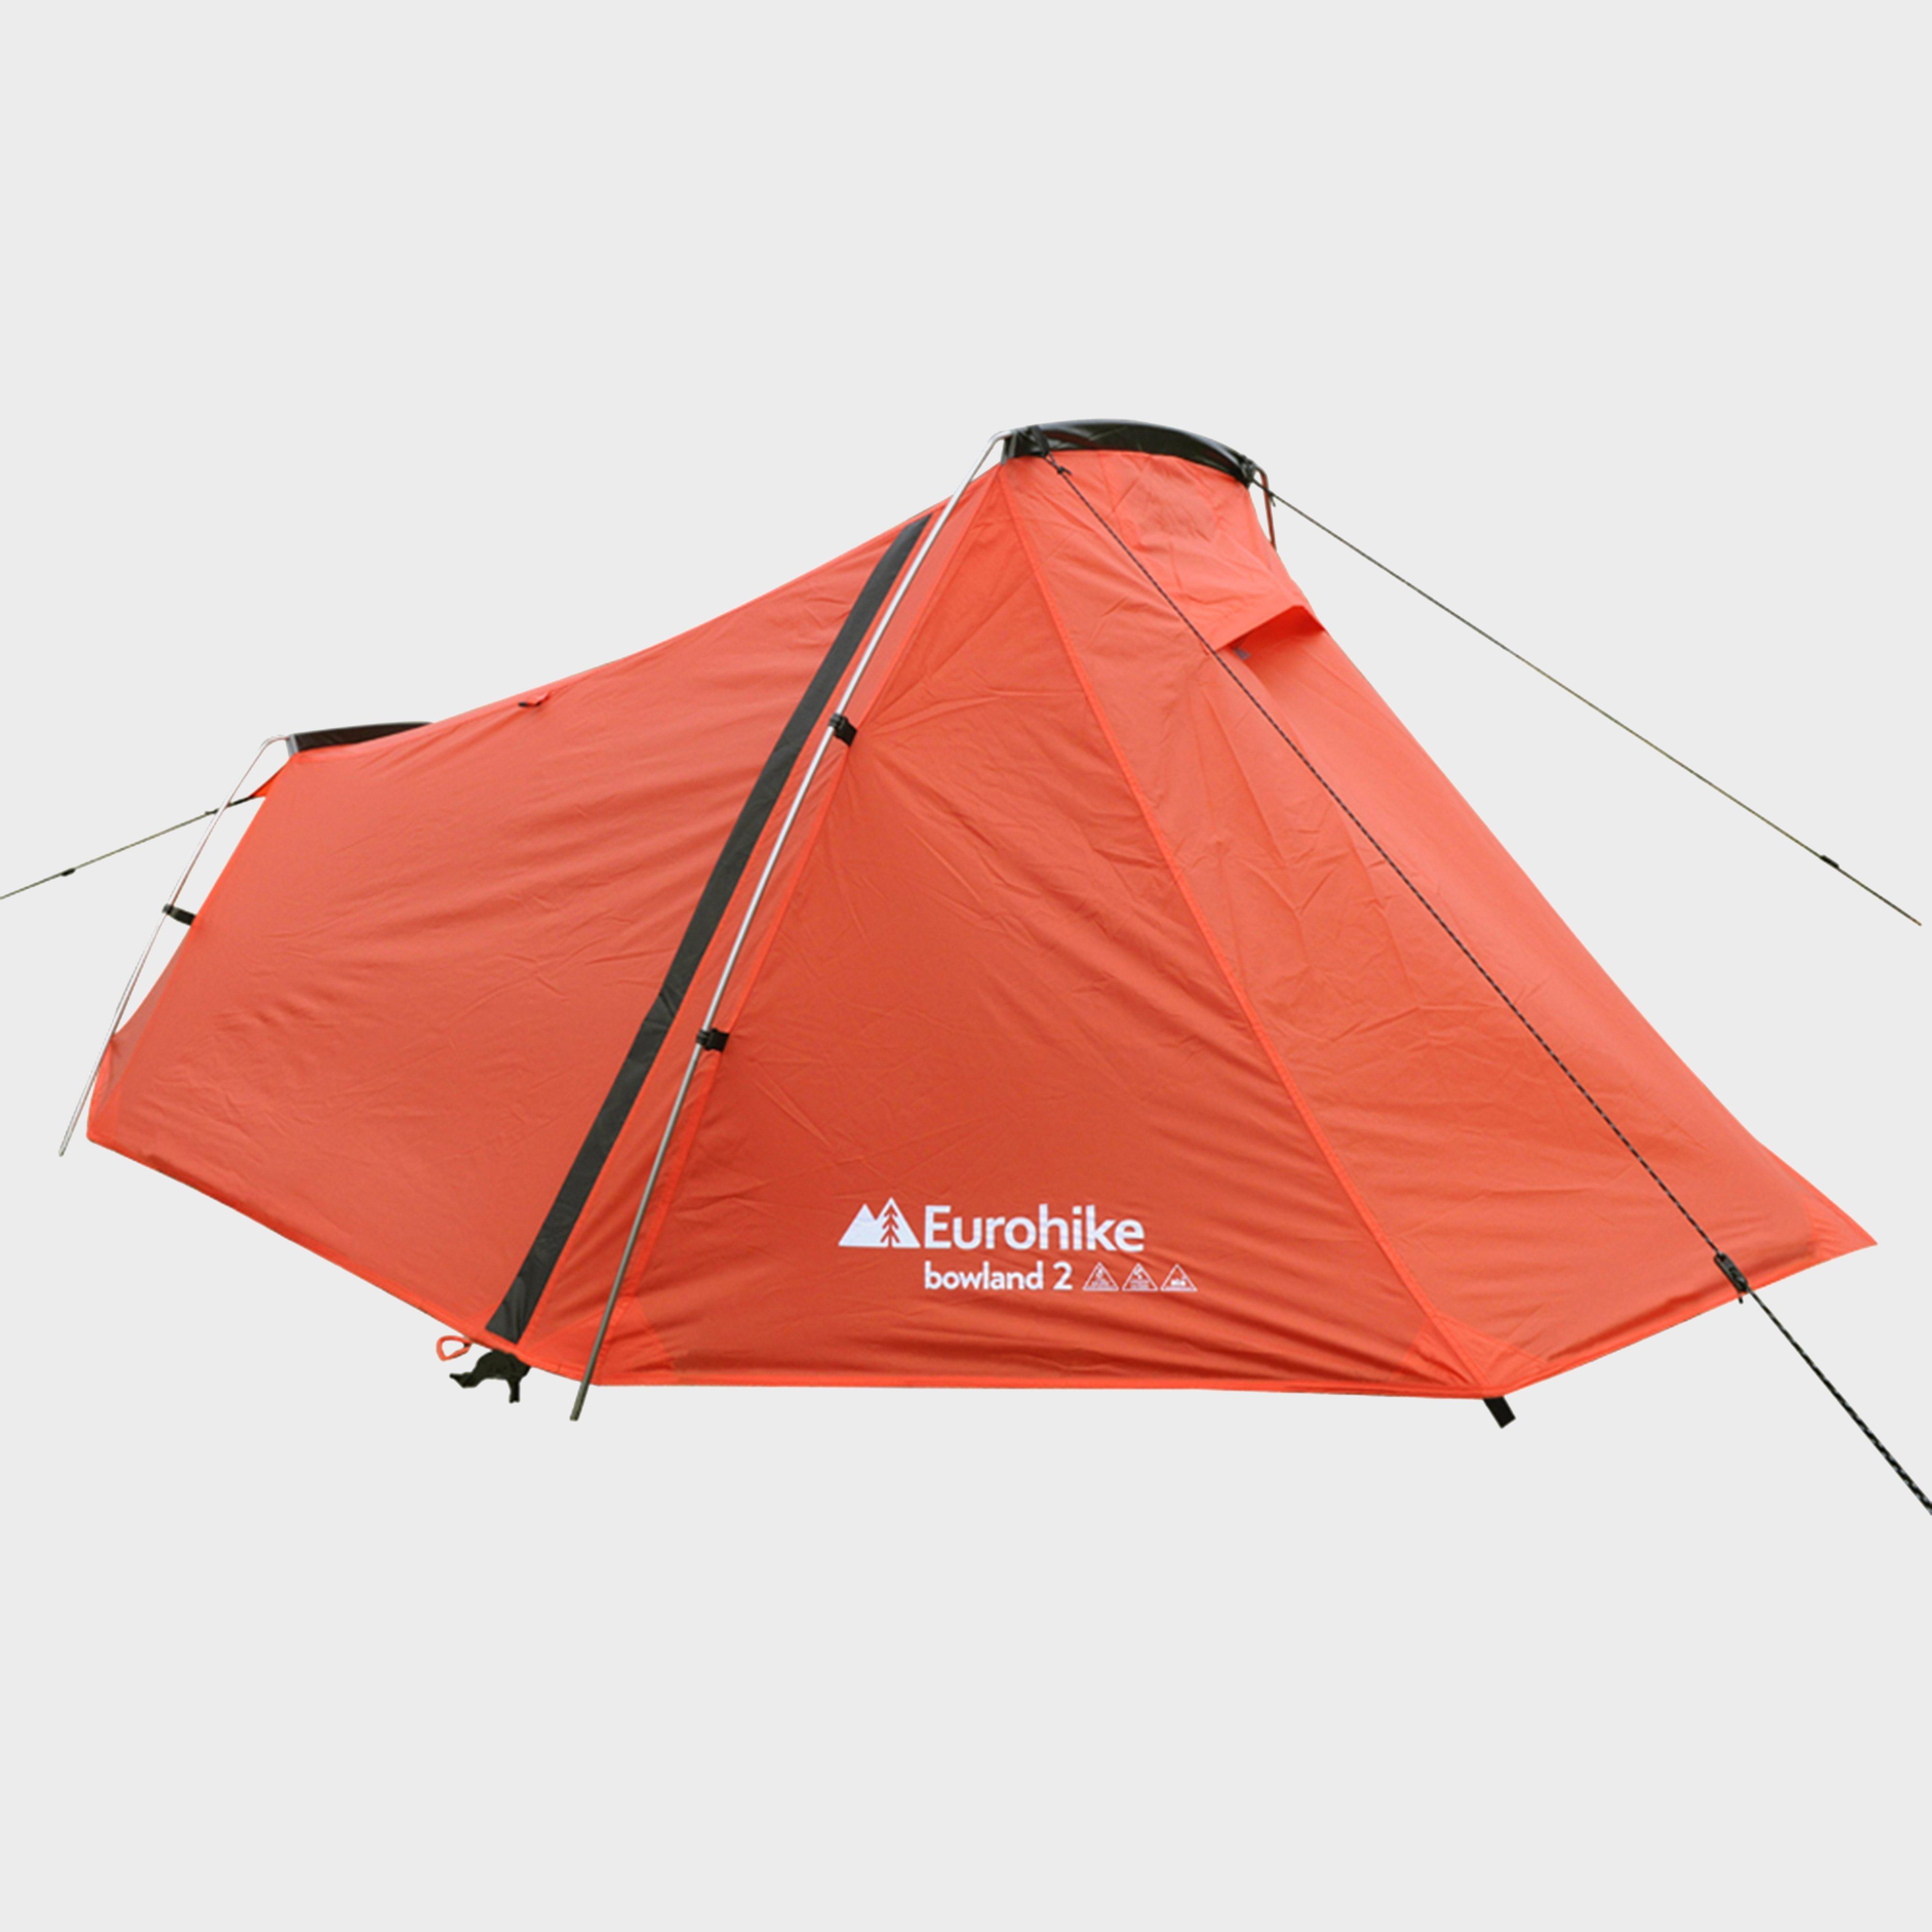 Eurohike Bowland 2 Tent